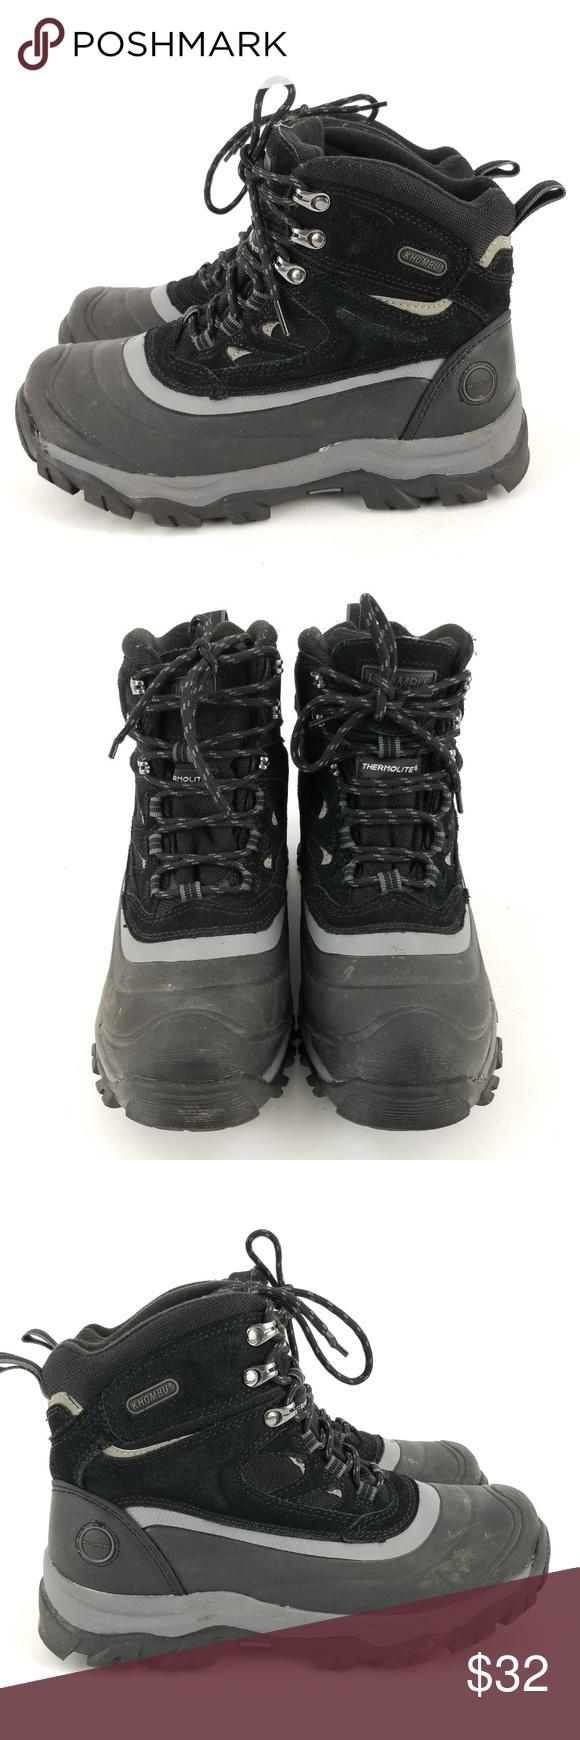 504f84caee1 Khombu Men's Flume Hiking Winter Snow Boots 9 EB29 Khombu Men's ...